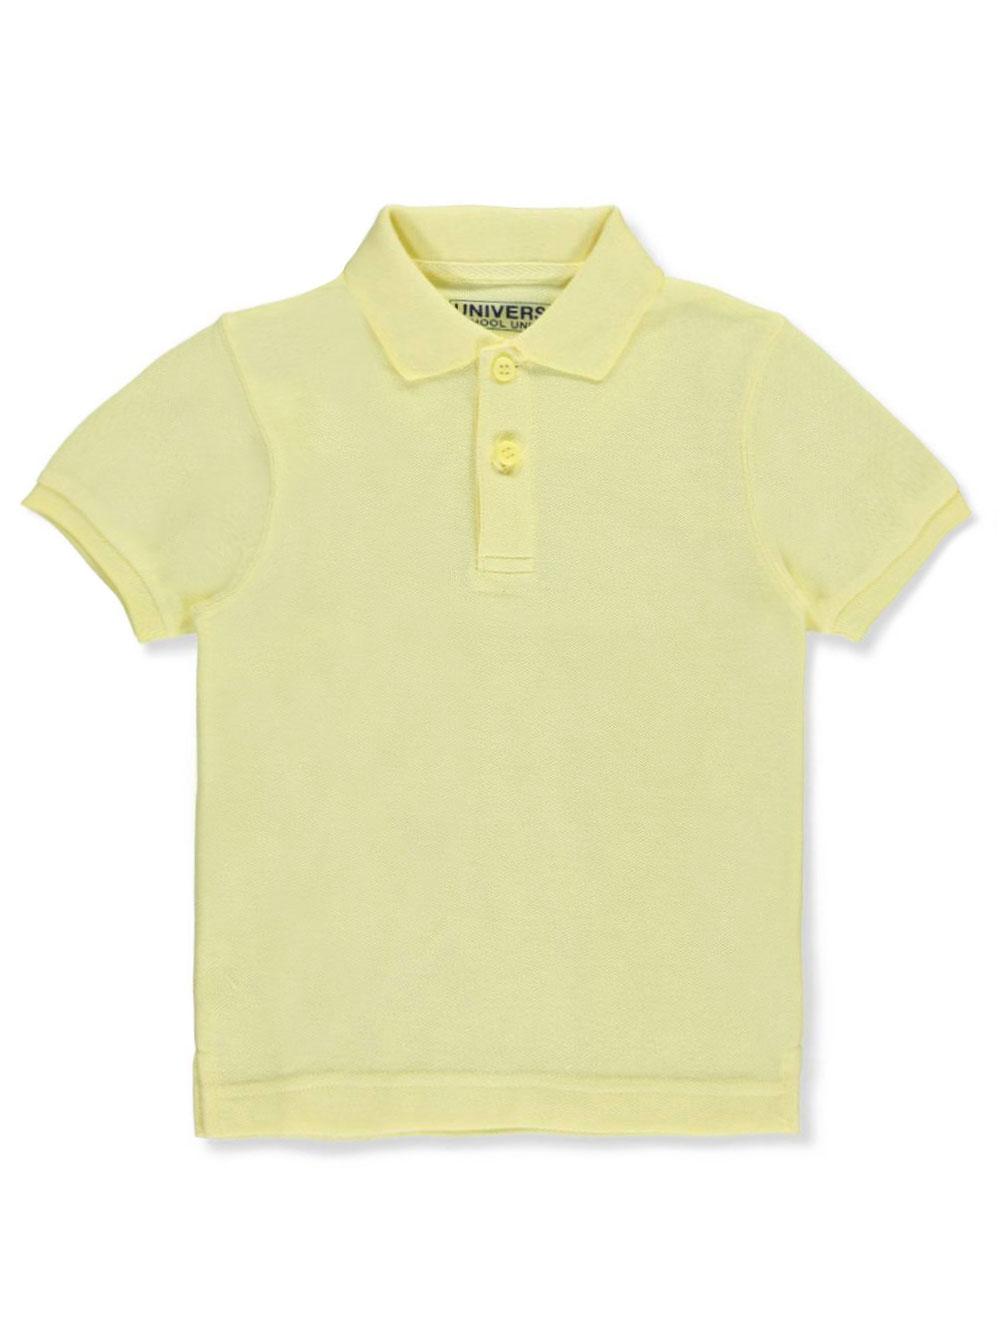 Universal School Uniforms Unisex Boys Girls Short Sleeve Pique Polo Shirt w/Stain Release (2T-20) by Univ- Sku:Staniu838YEL7; Color:YELLOW; Size:7 7